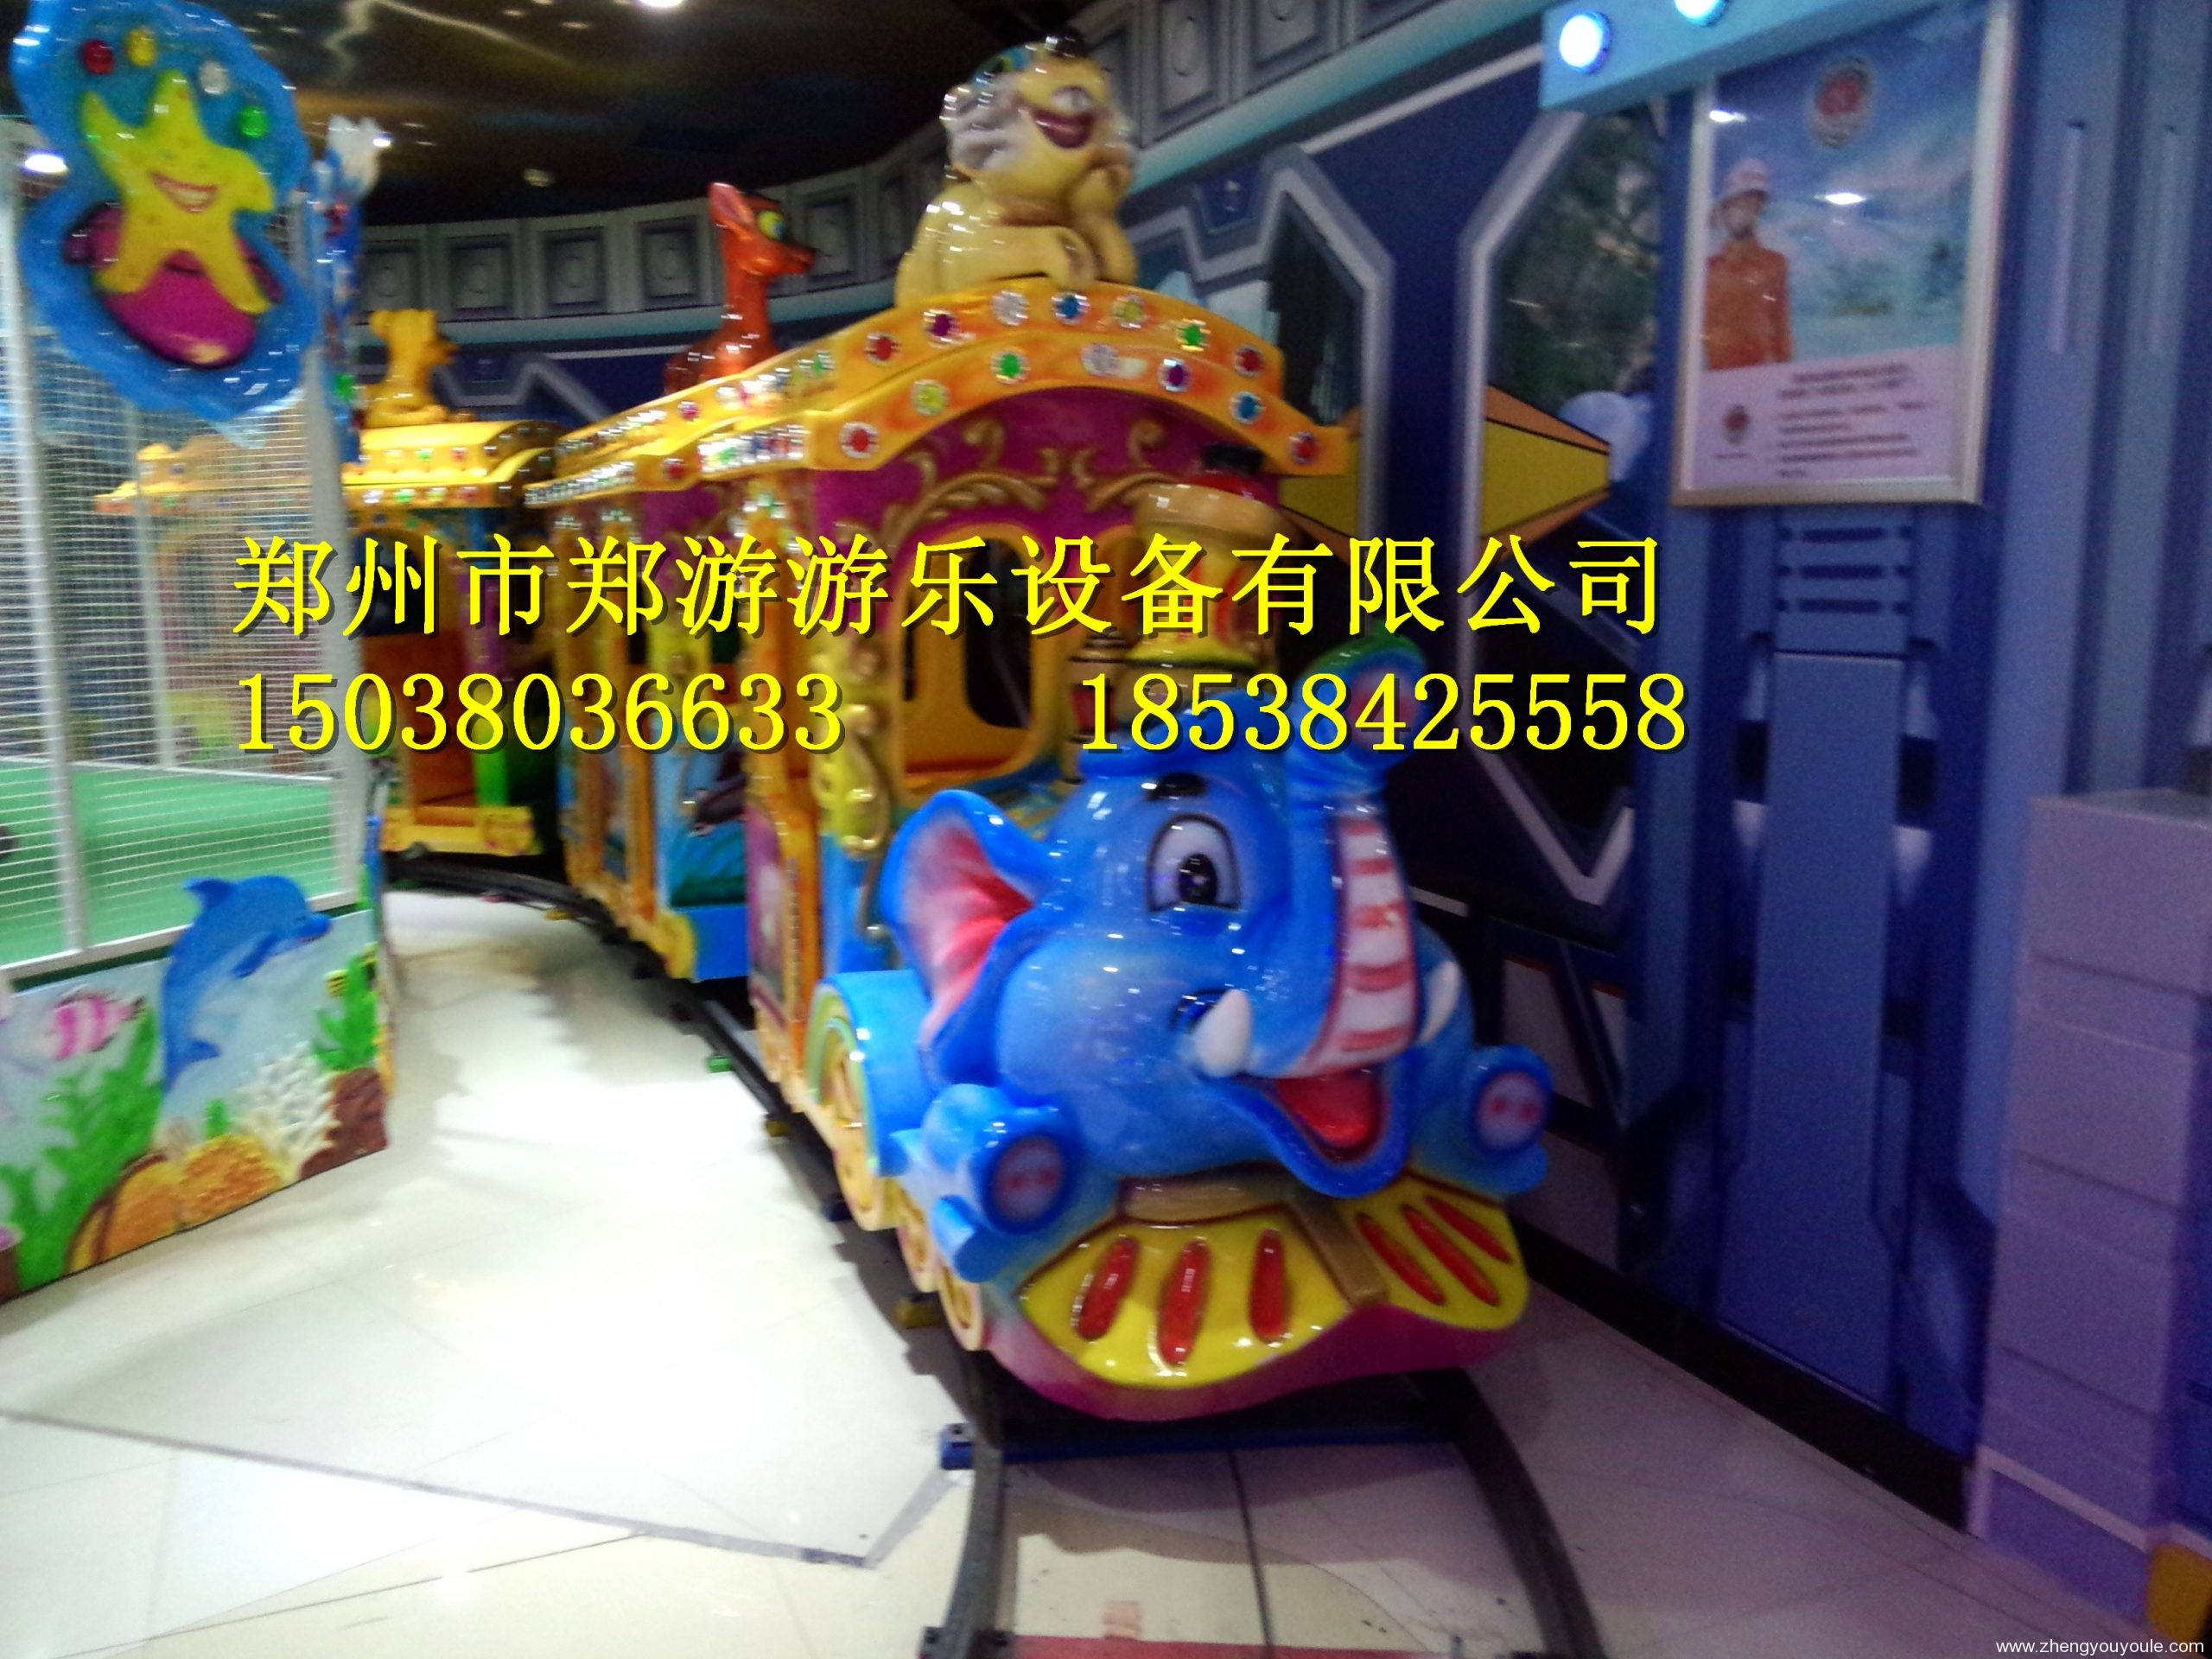 2020030611471338 scaled - 轨道类—轨道火车